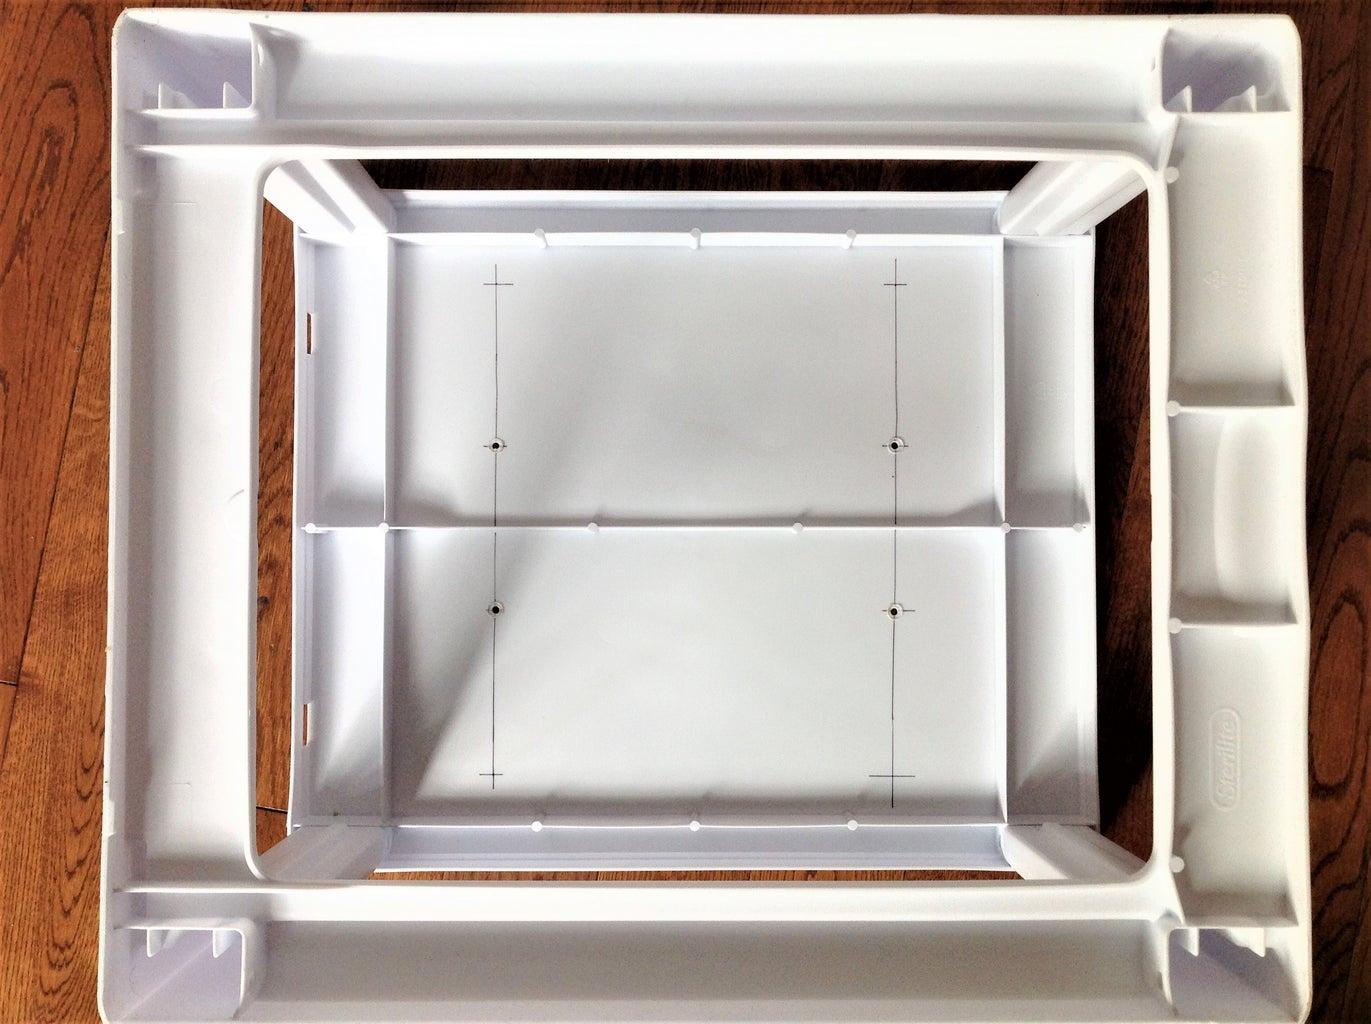 Install Grow Lights on Box Lid